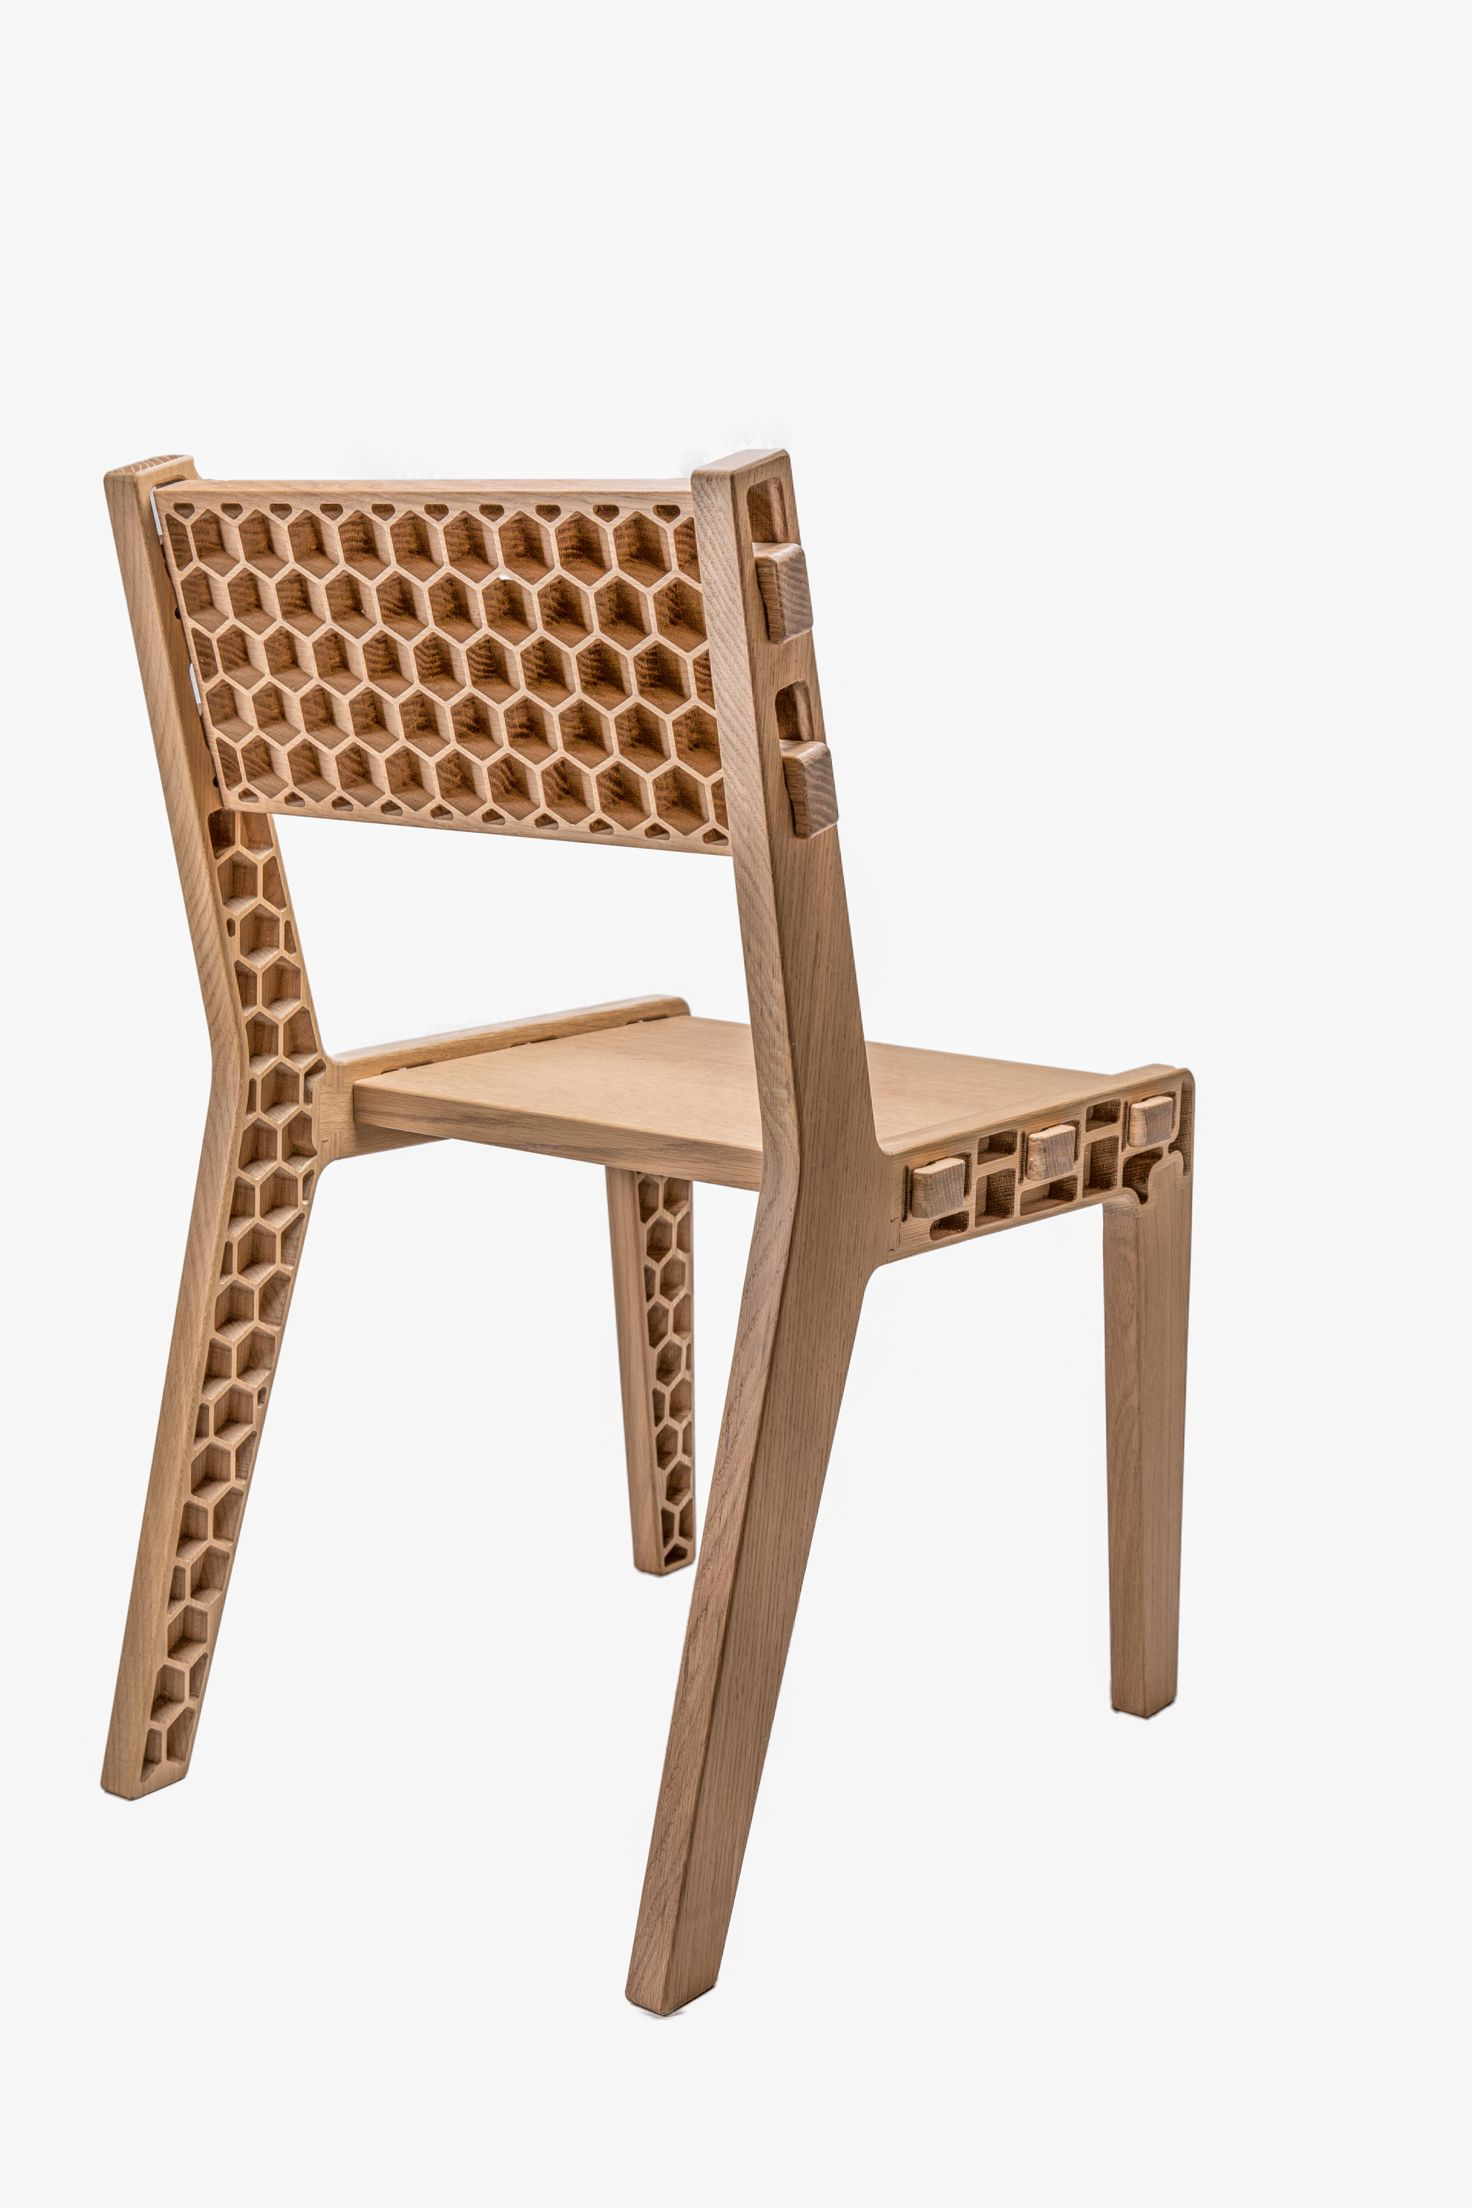 Housefish Honeycomb Chair  Ultra Lightweight Flat Packable Solid Wood Chair